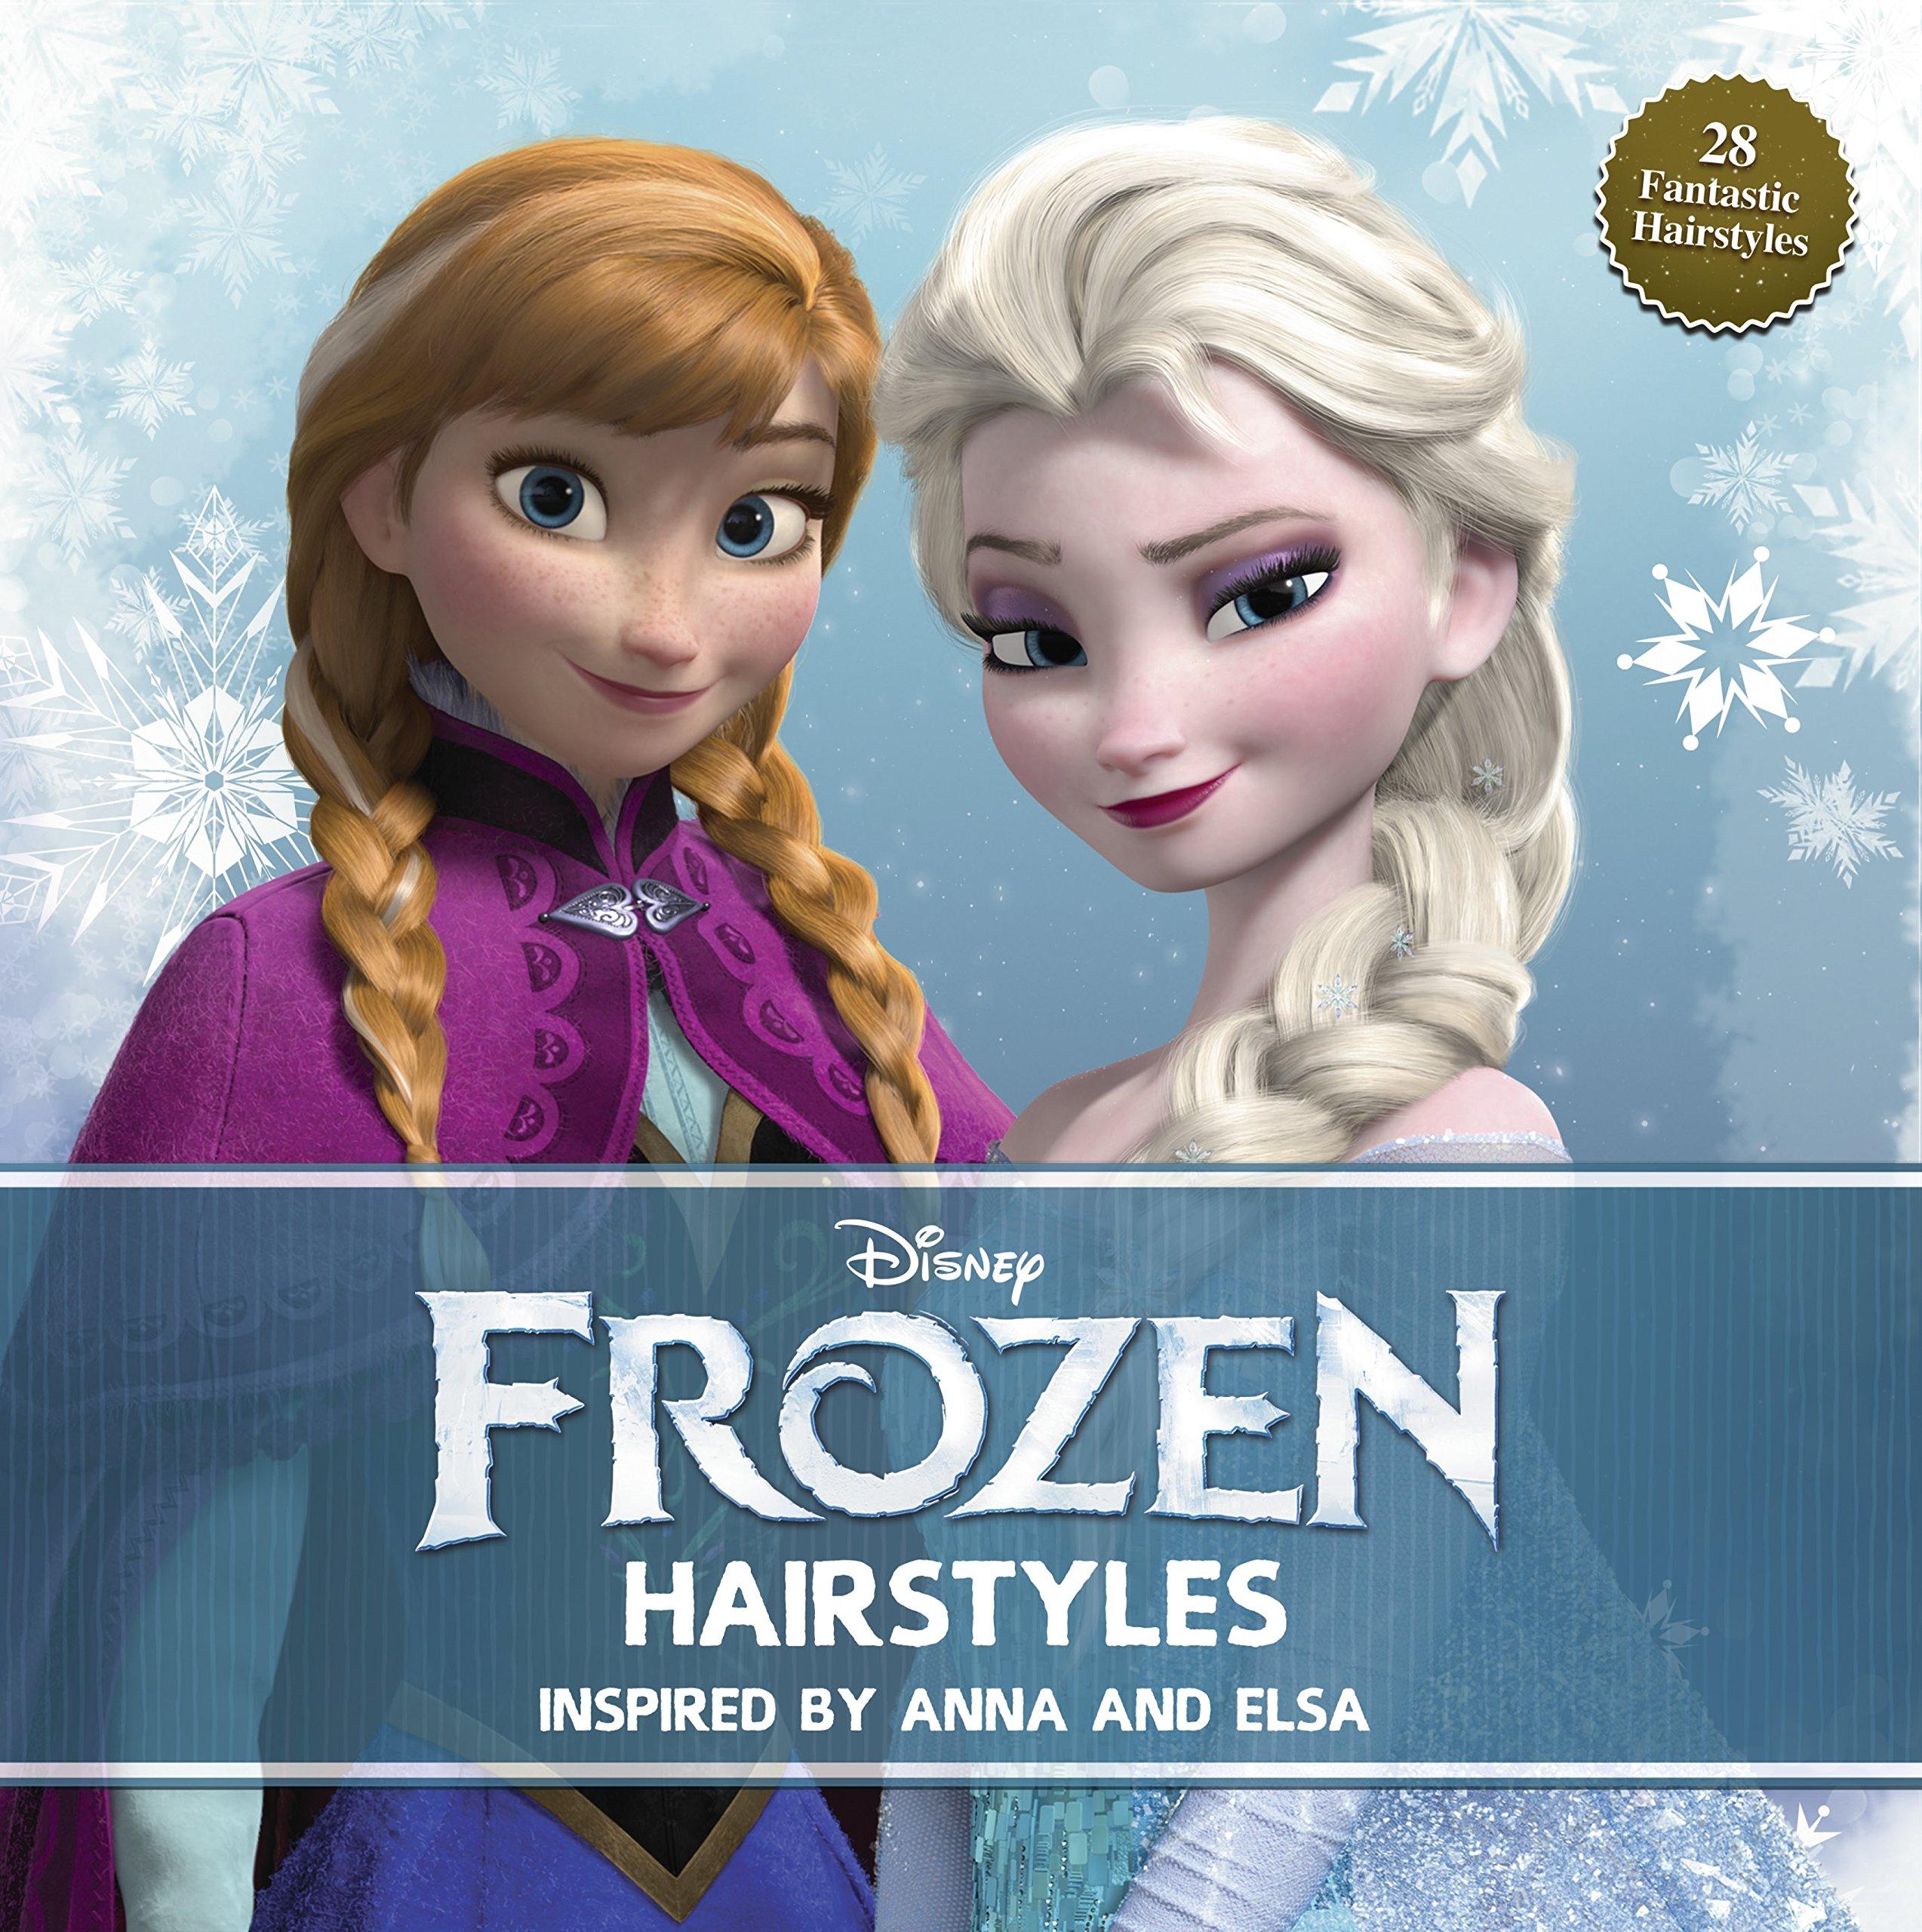 Disney Hairstyles wonderful diy disney frozen elsas hairstyle elsa braid braid hairstyles and hair dos Disney Frozen Hairstyles Inspired By Anna And Elsa Edda Usa Editorial Team 9781940787091 Amazoncom Books